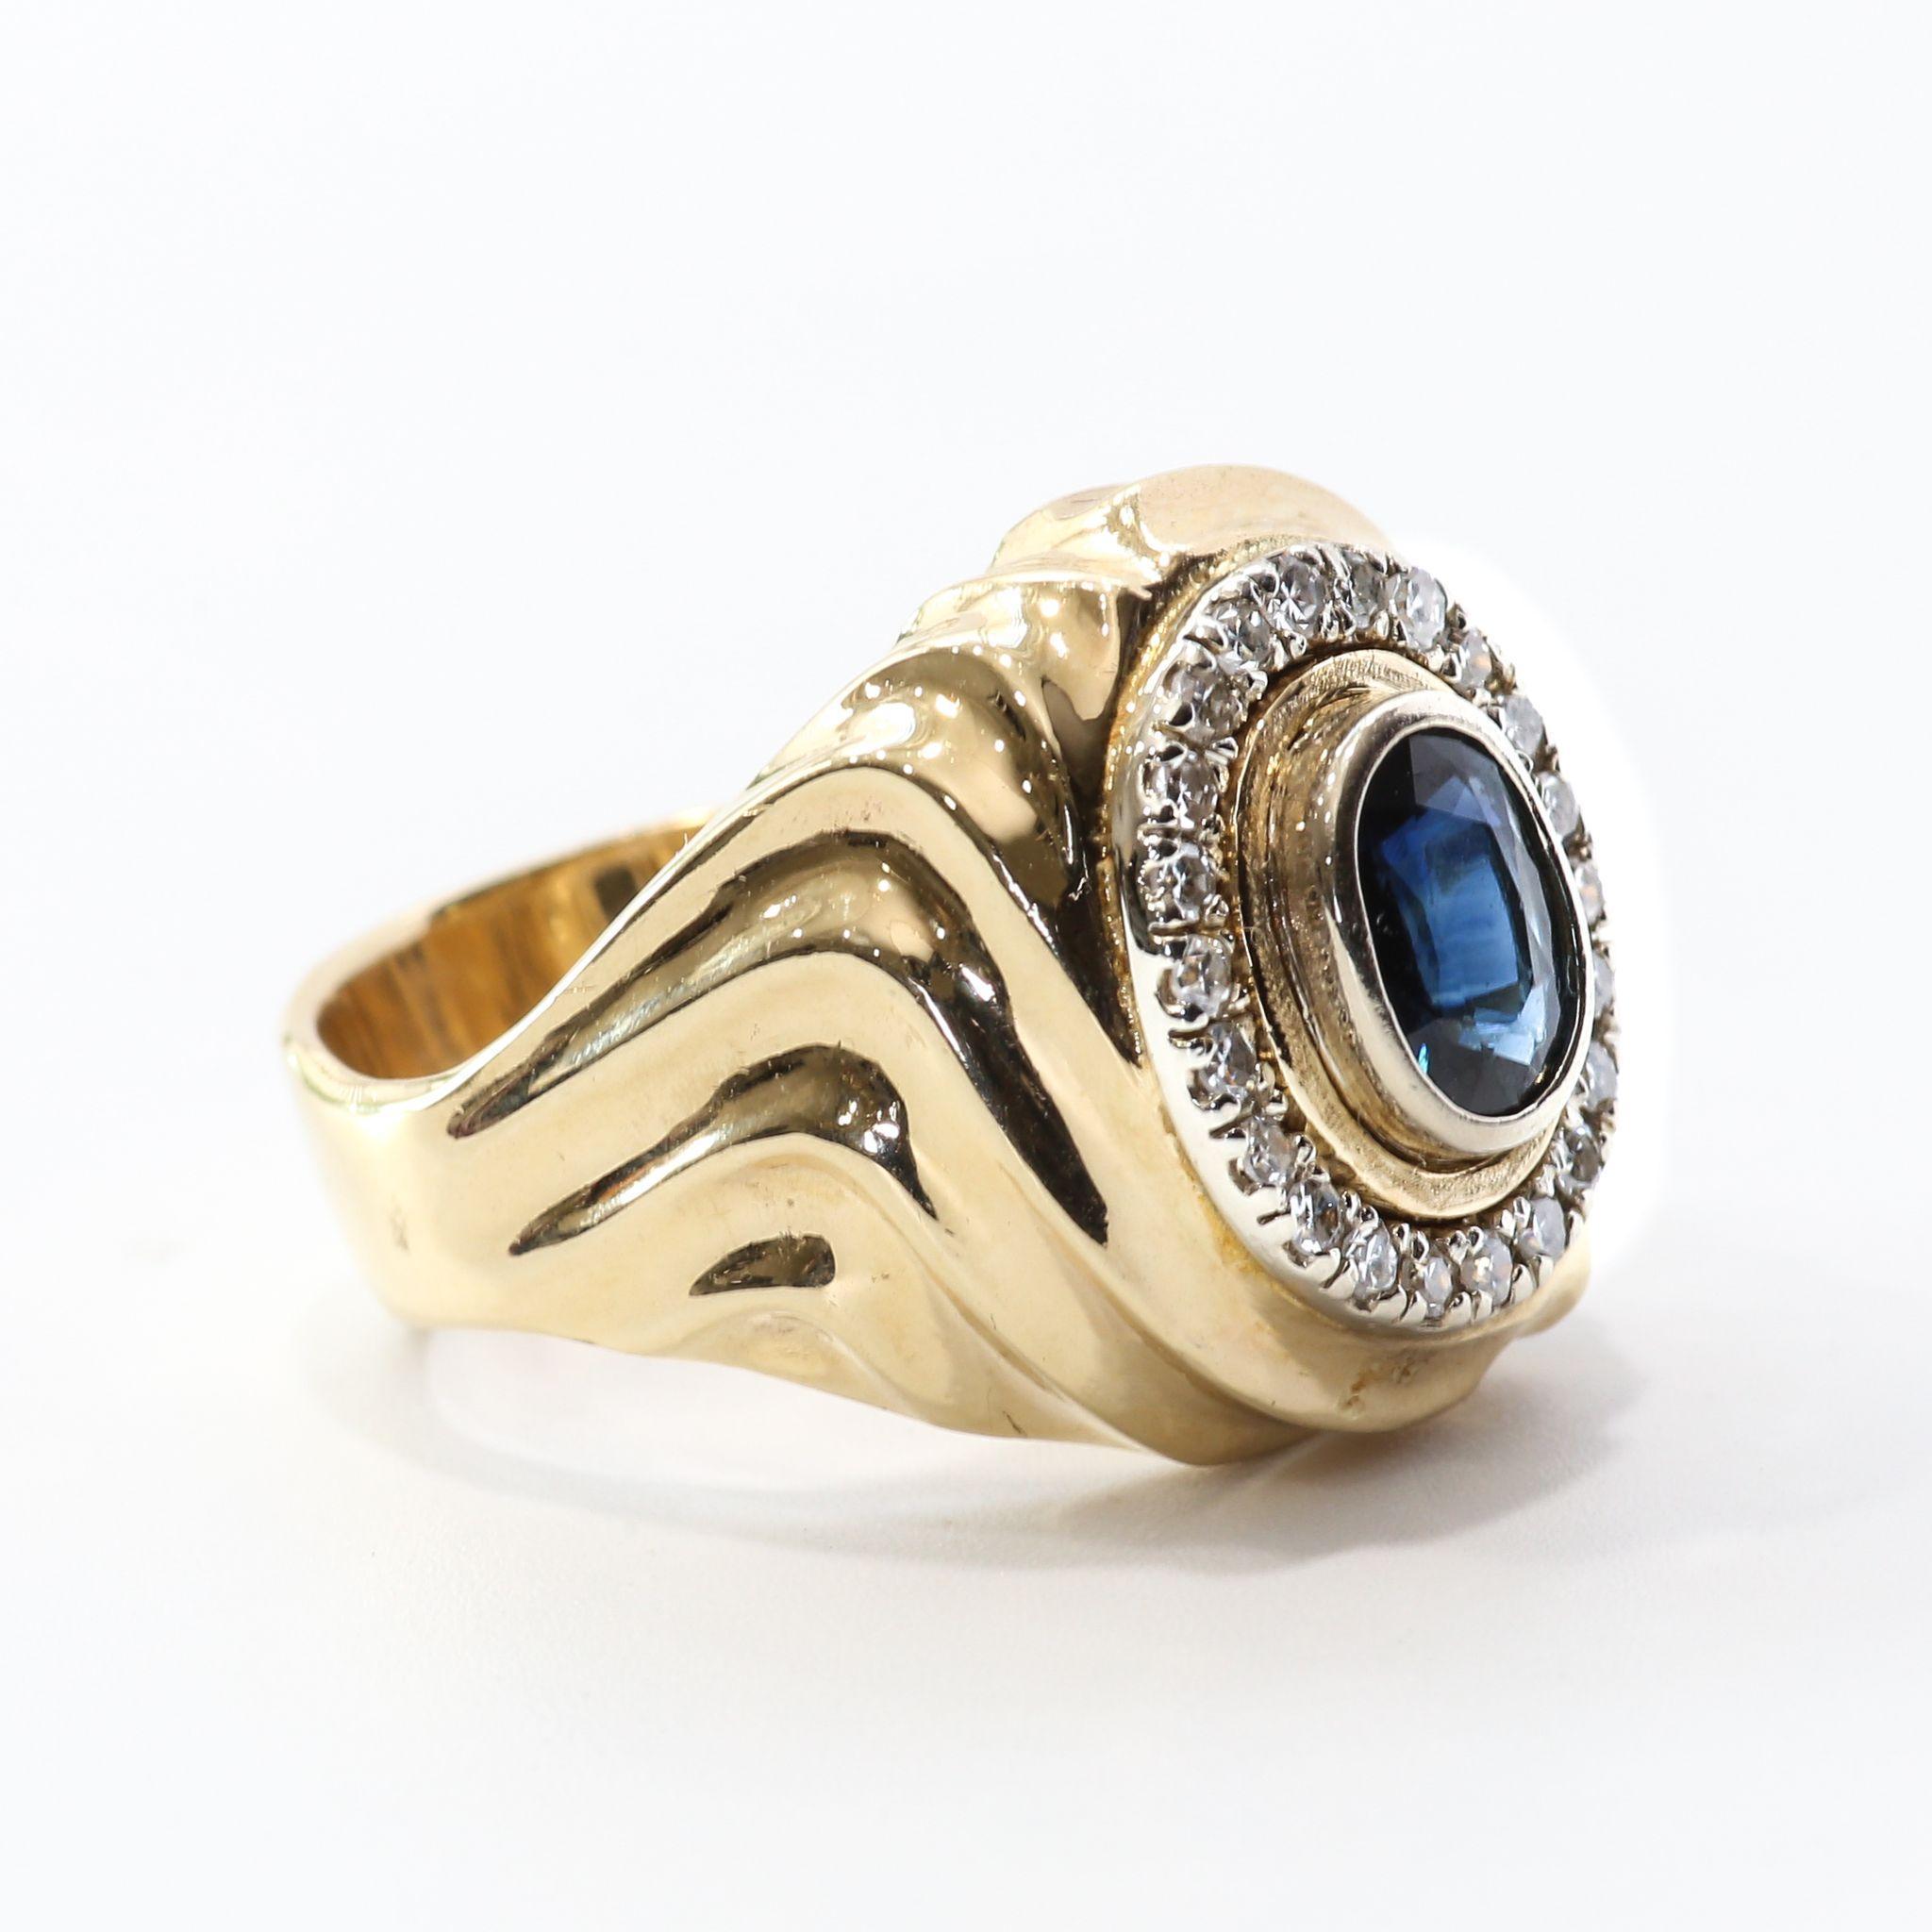 Gent's Vintage 14K Natural Sapphire & Diamond Ring